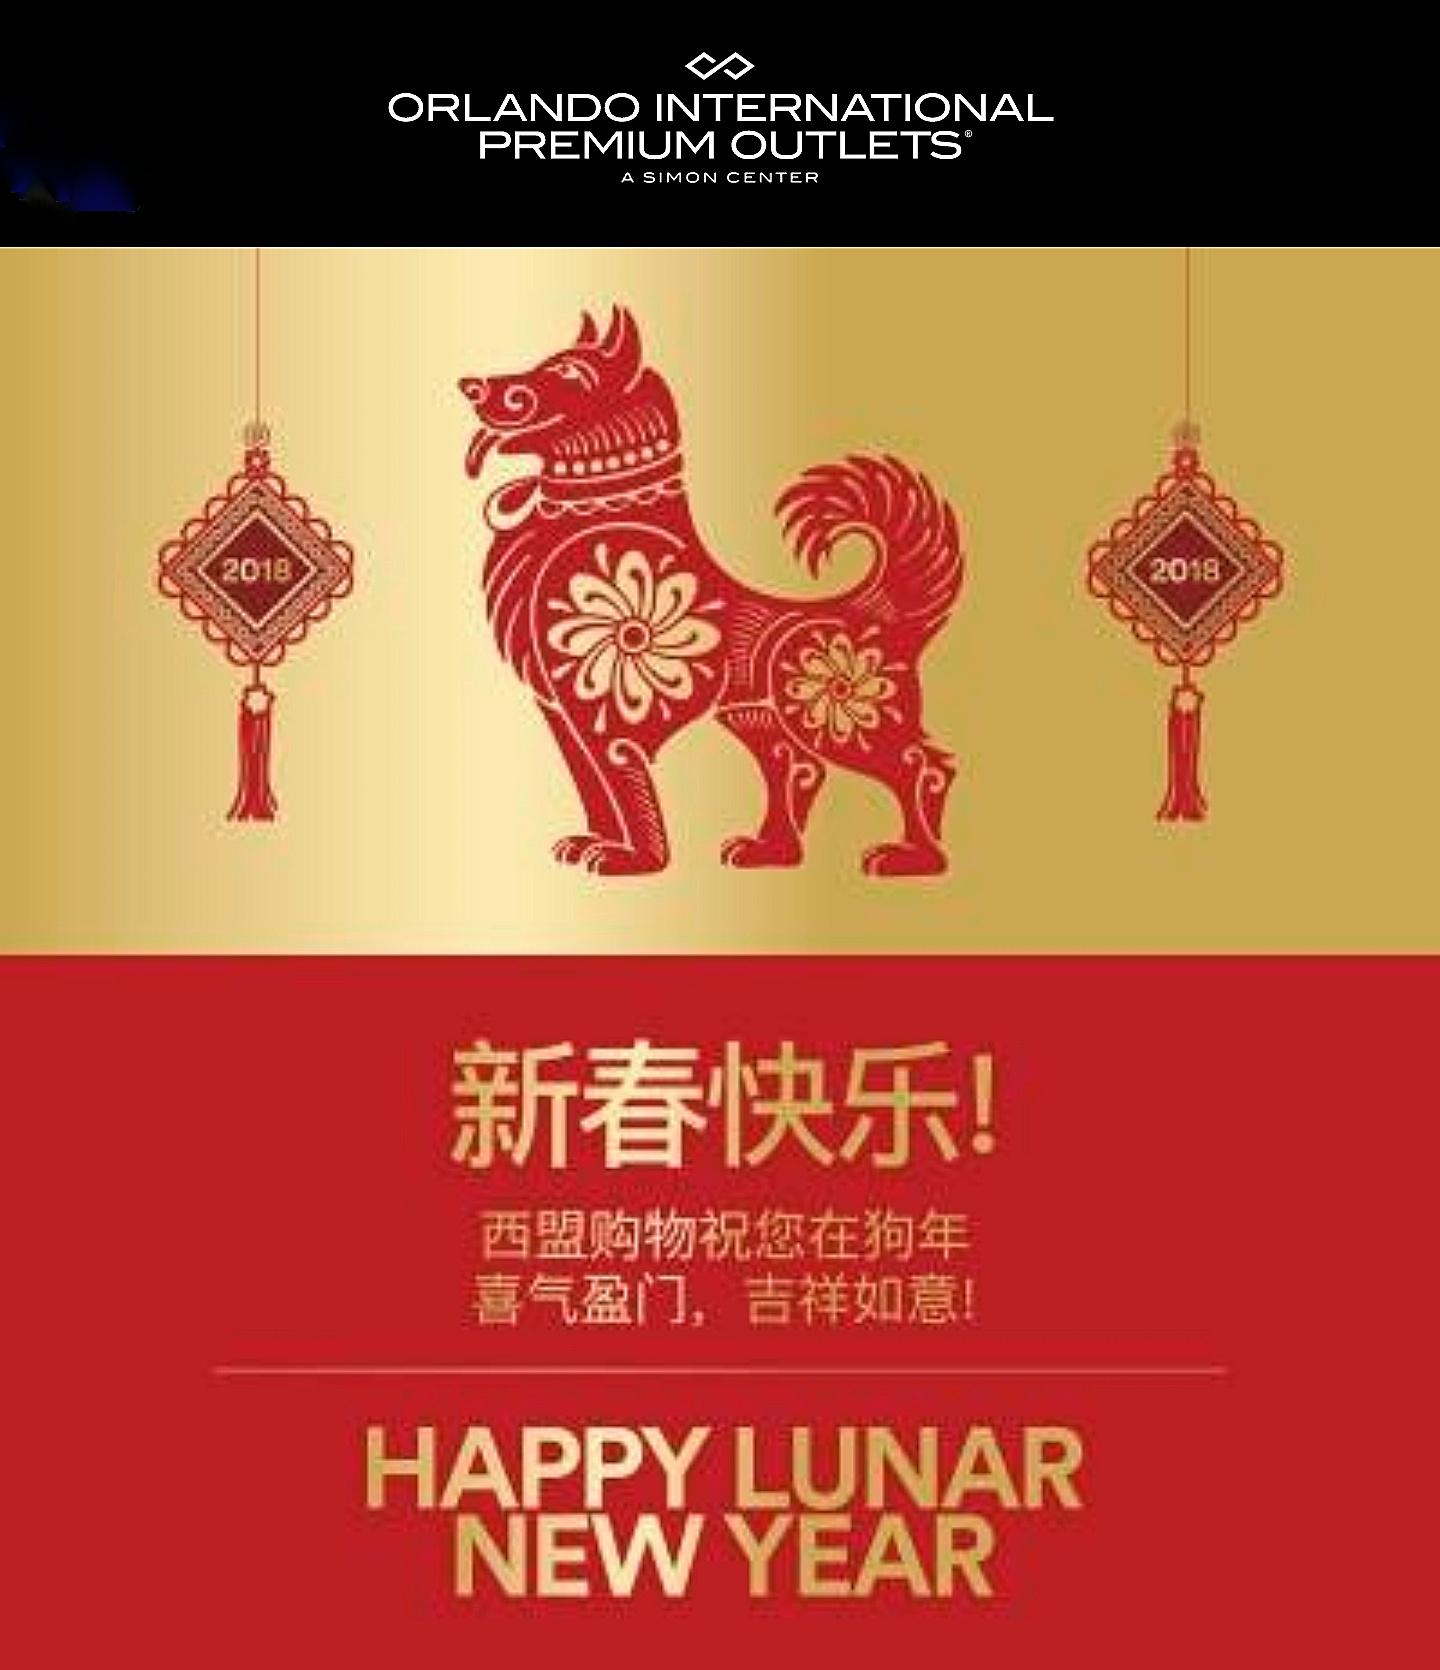 Orlando Vineland Premium Outlets Chinese New Year